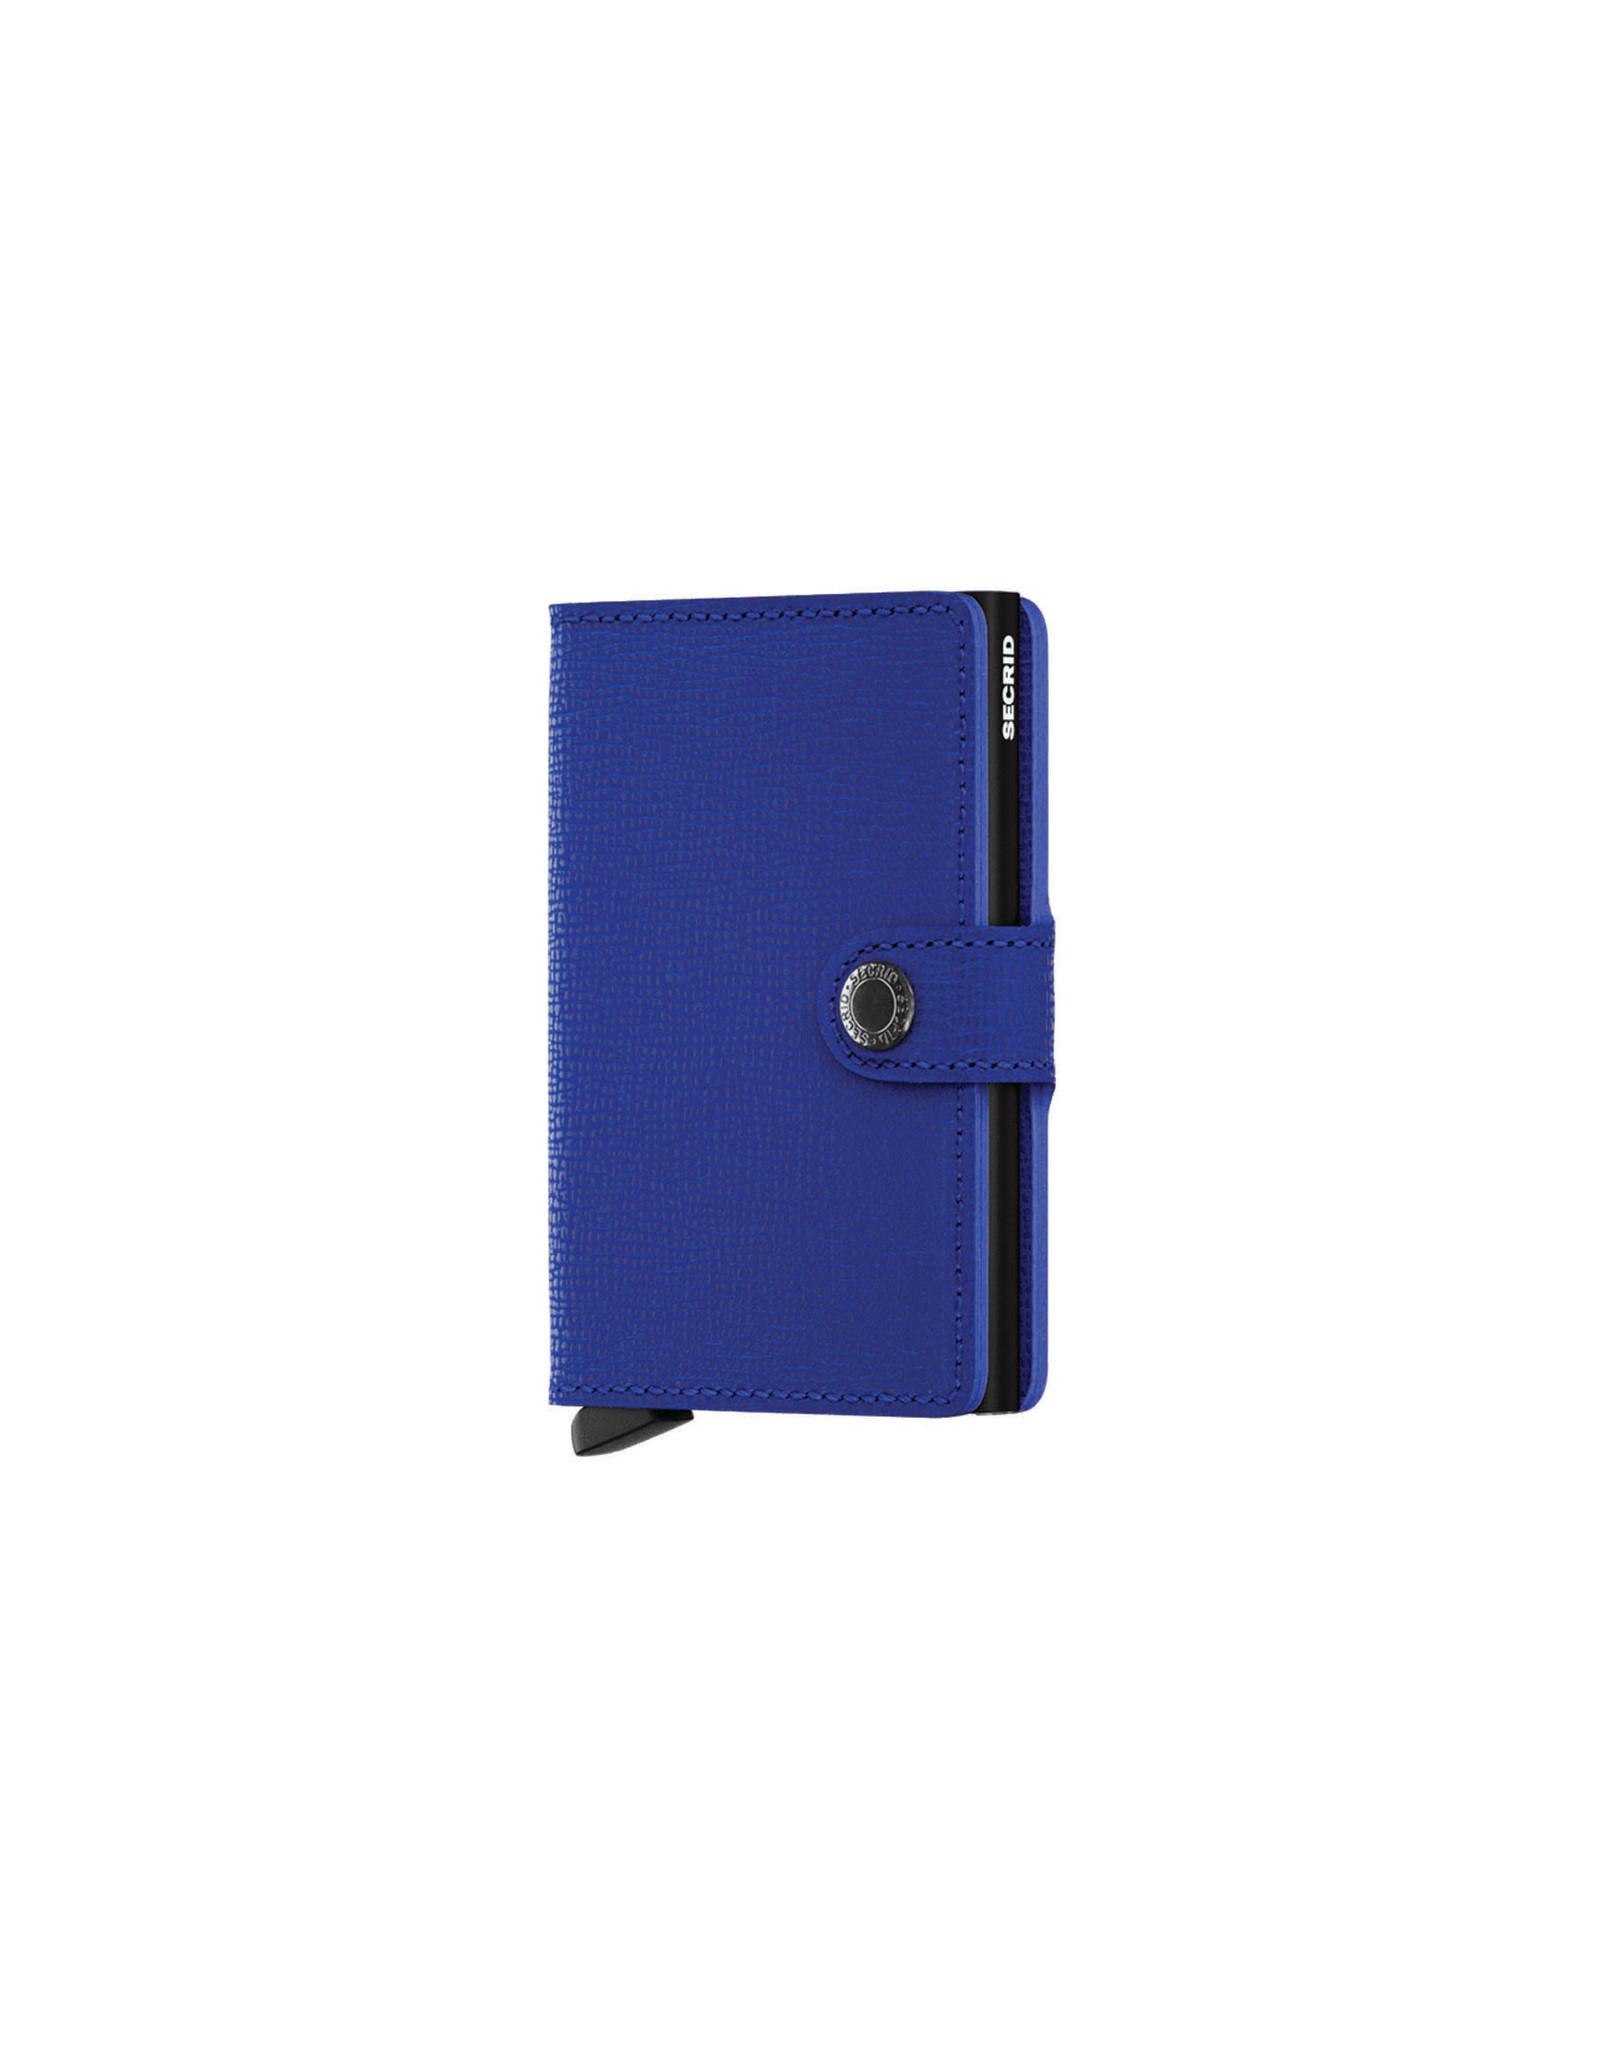 Secrid Miniwallet , Crisple Blue-Black